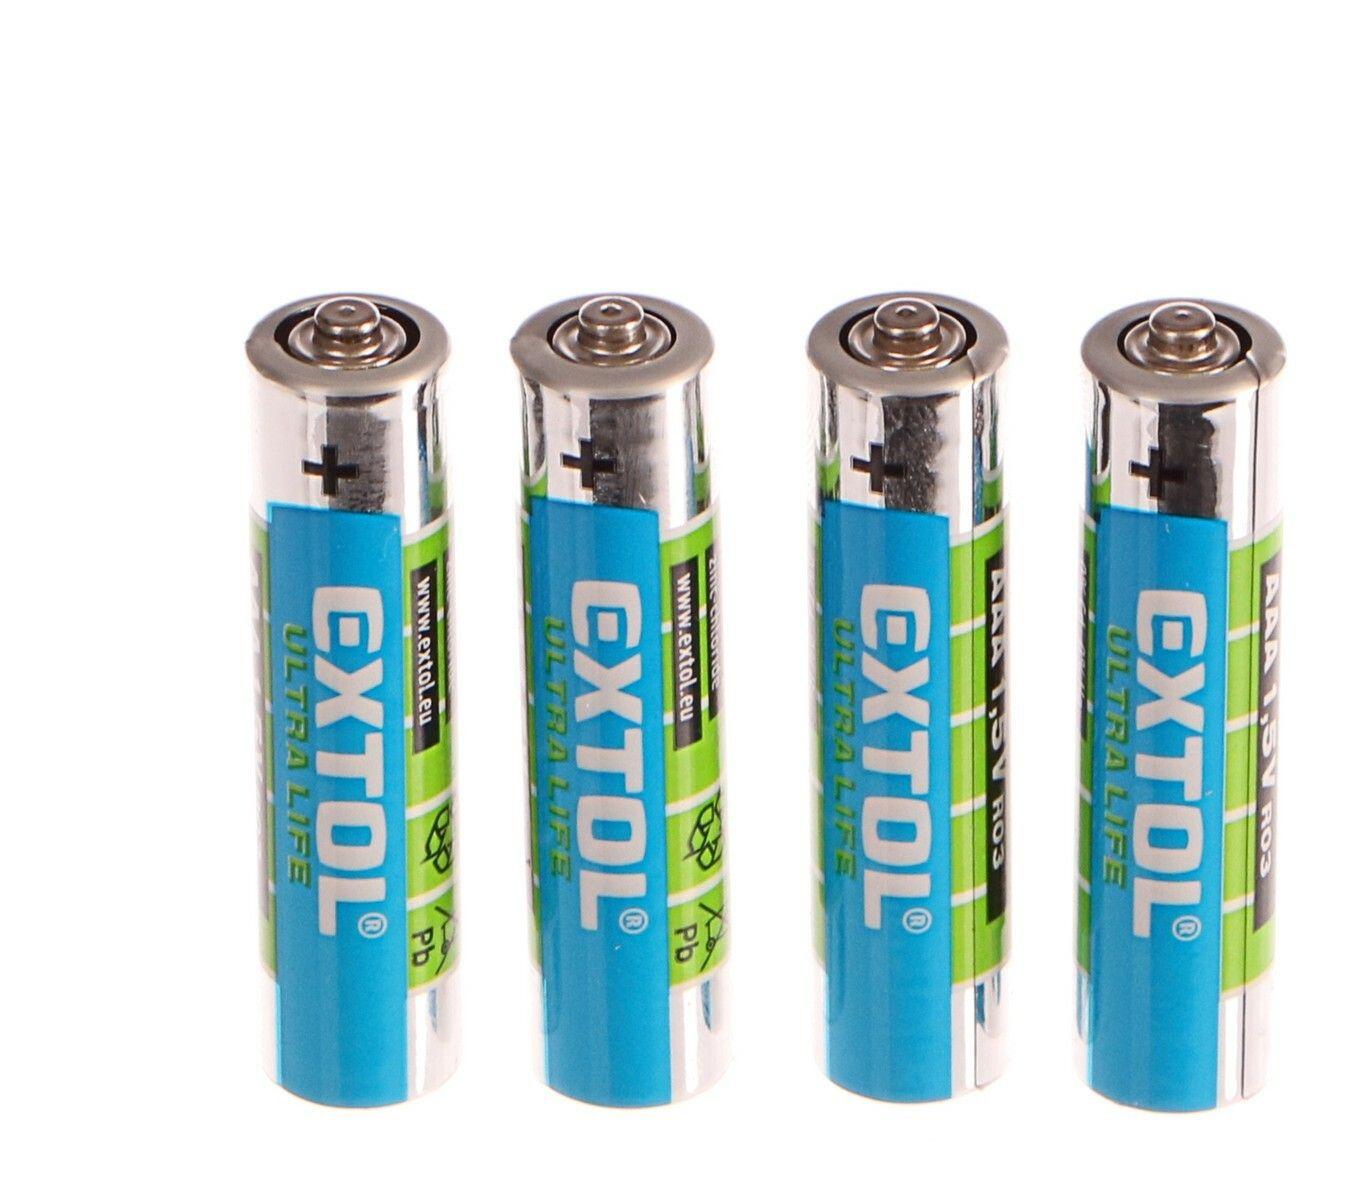 Baterie zink-chloridové, 4ks, 1,5V AAA (LR03)